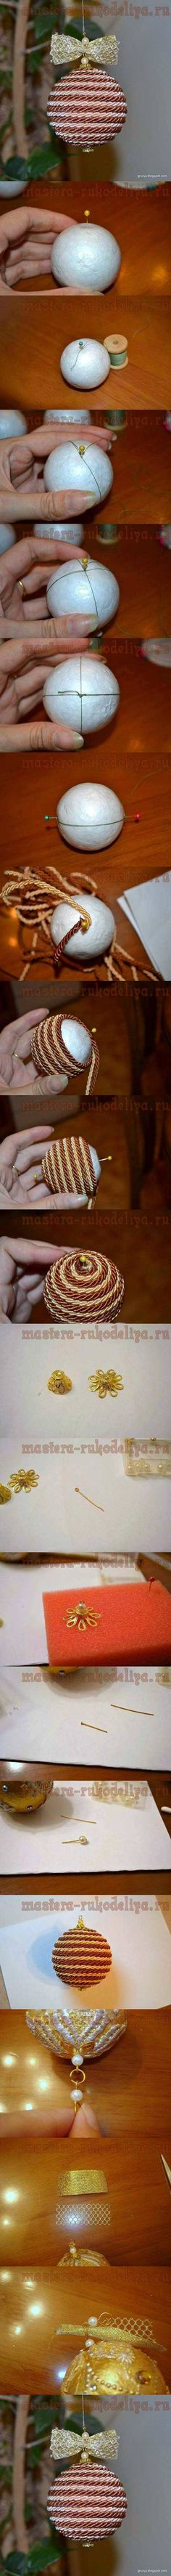 DIY Ball of String DIY Projects | UsefulDIY.com Follow Us on Facebook ==> http://www.facebook.com/UsefulDiy